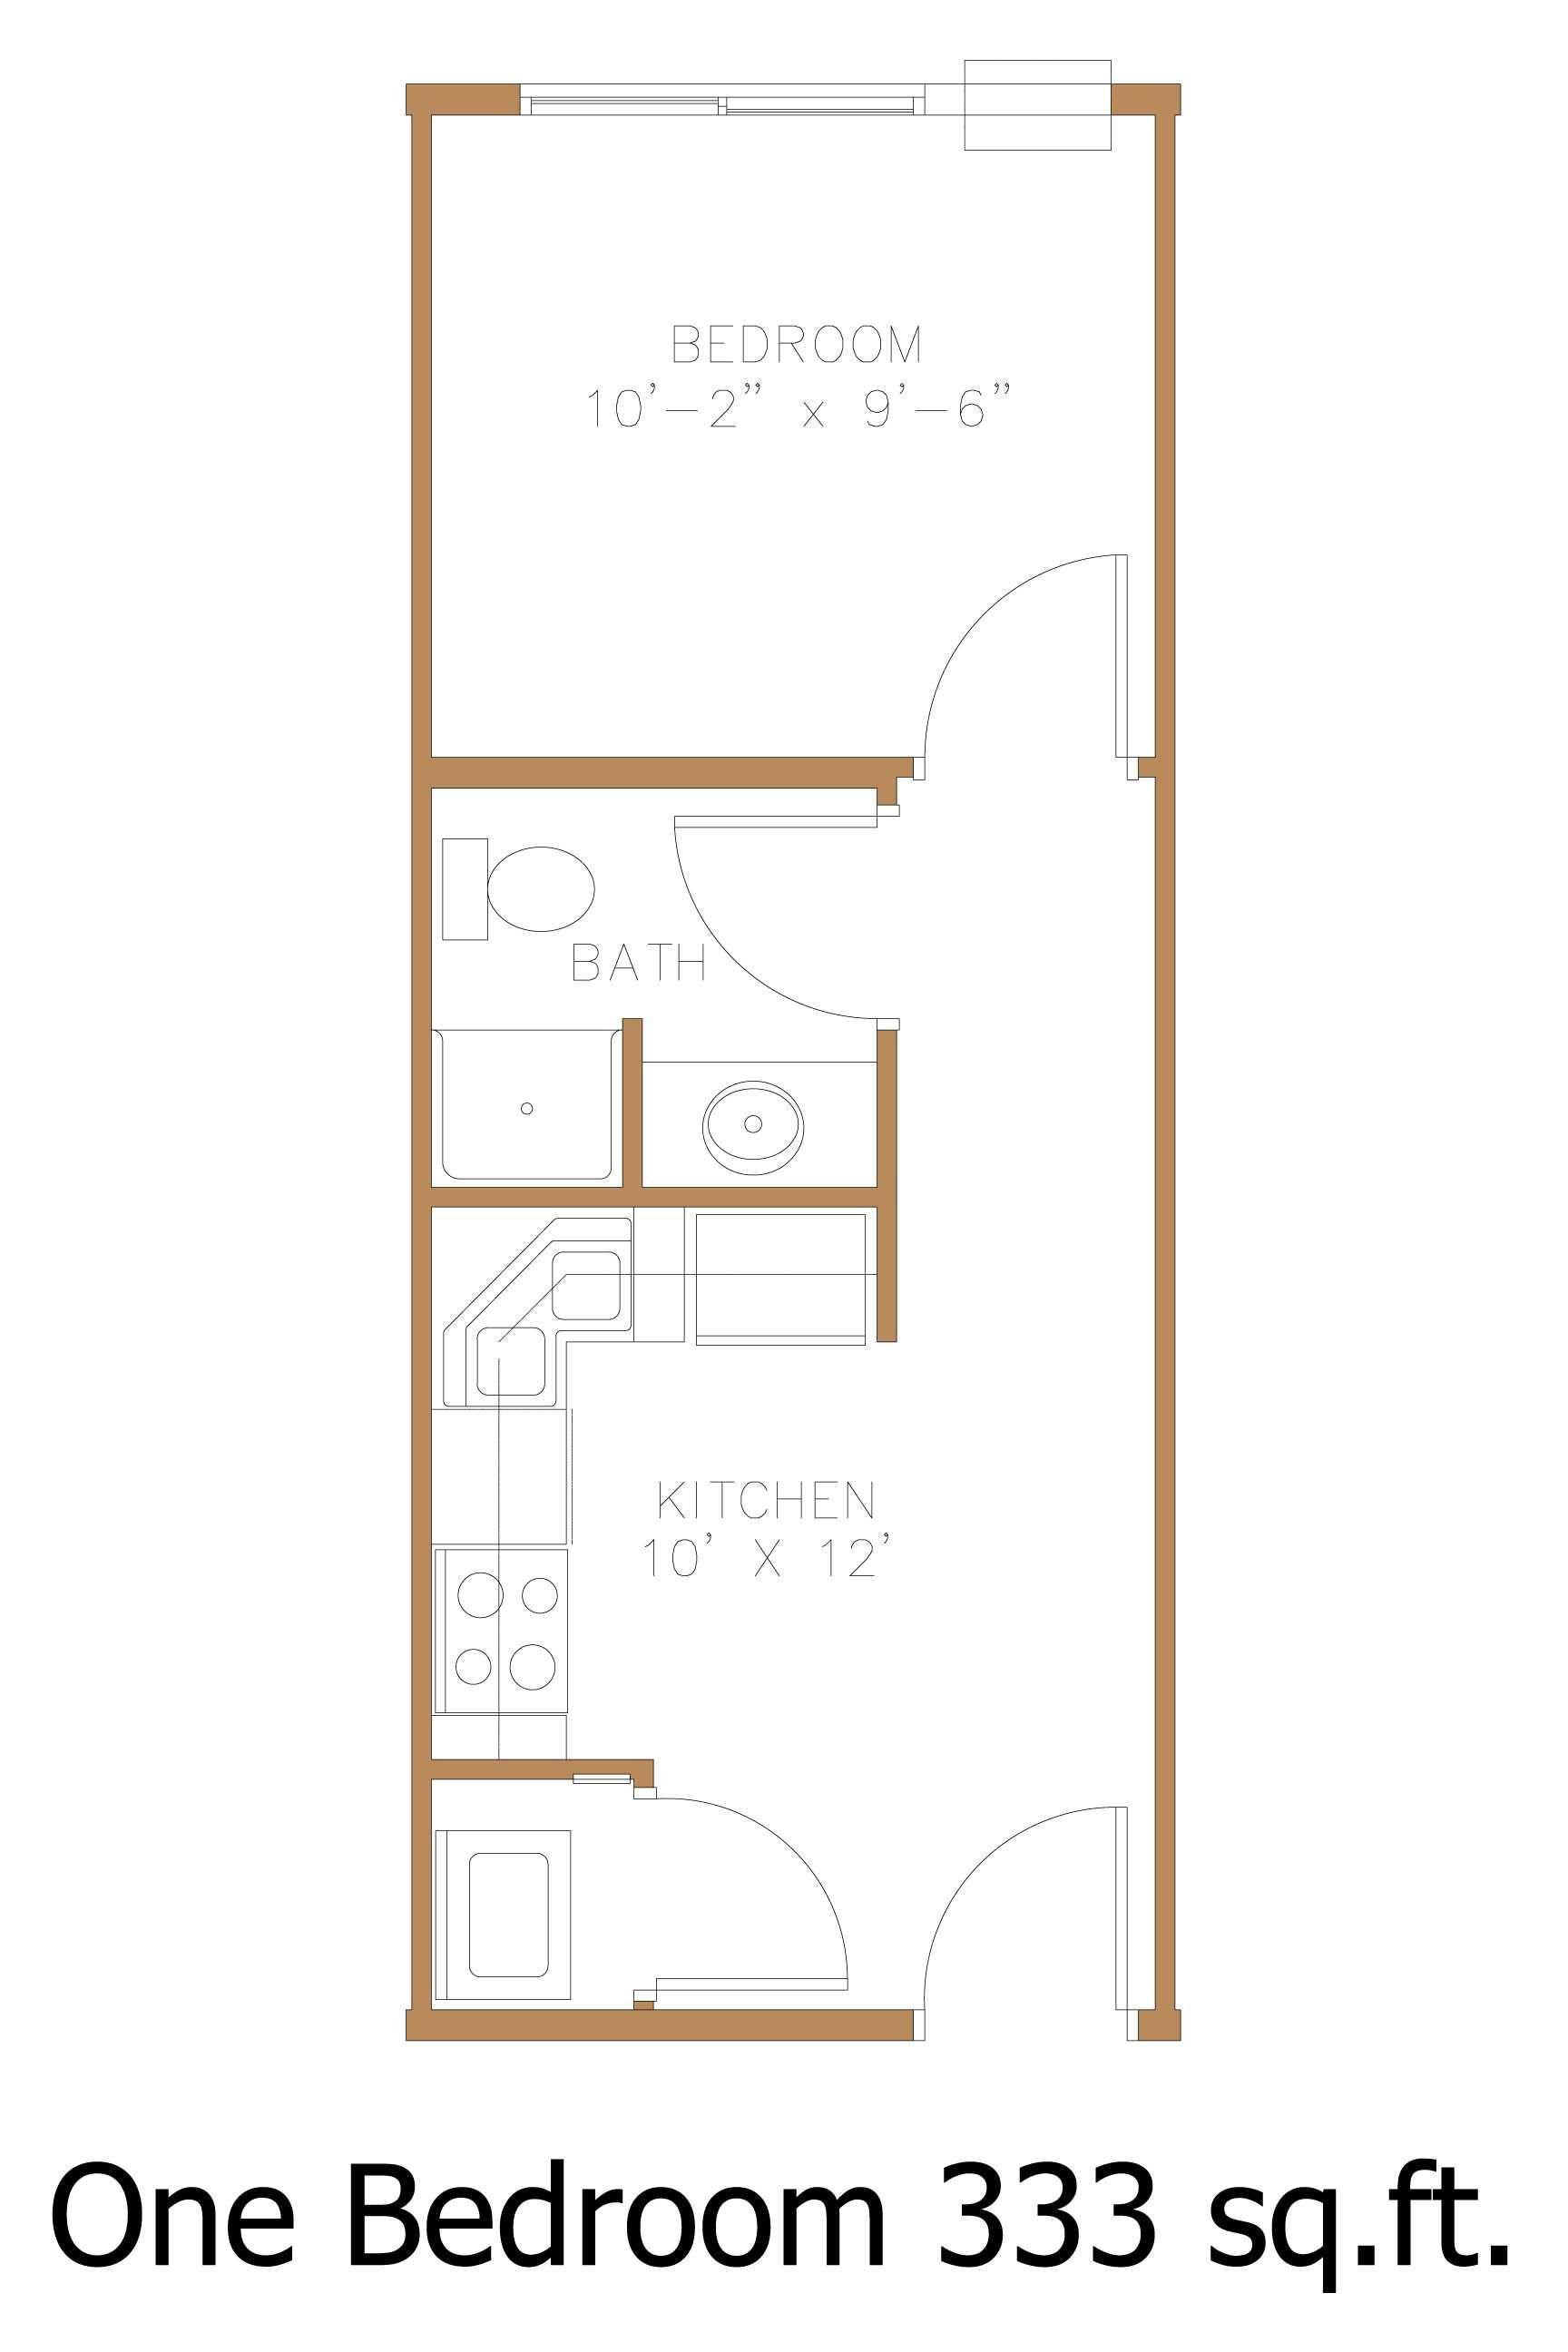 1 Bedroom Flat Layout